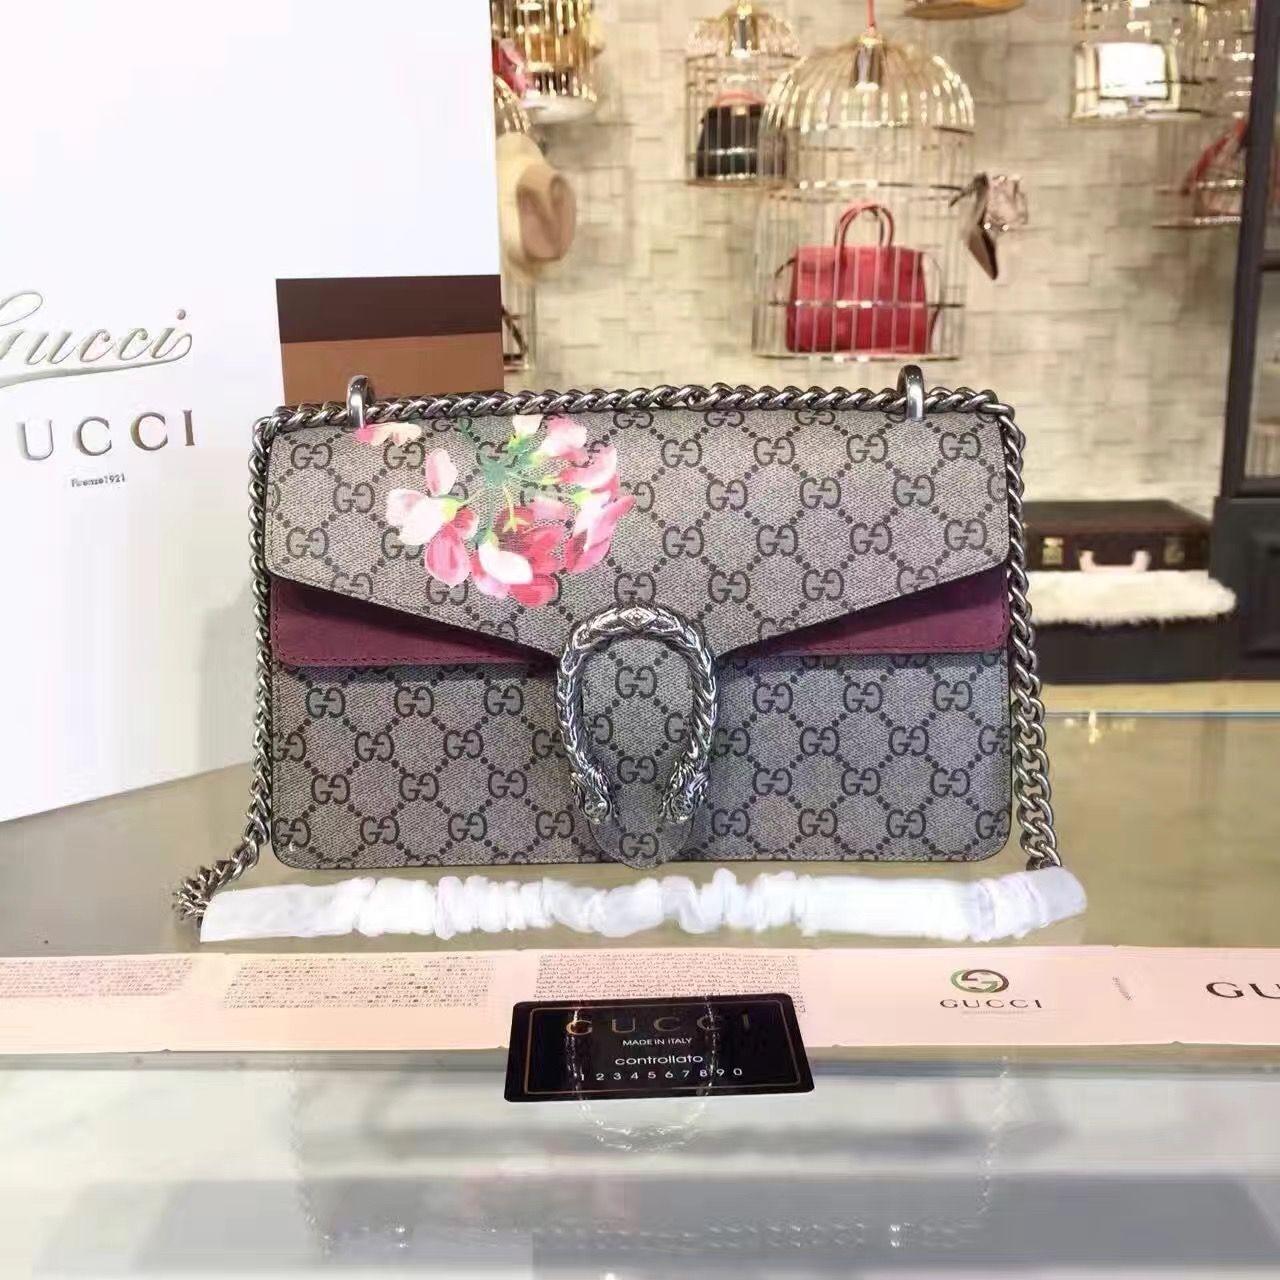 3f2ce1c24b1 Gucci Dionysus Blooms Print Small Shoulder Bag Vintage Rose 400249 2016